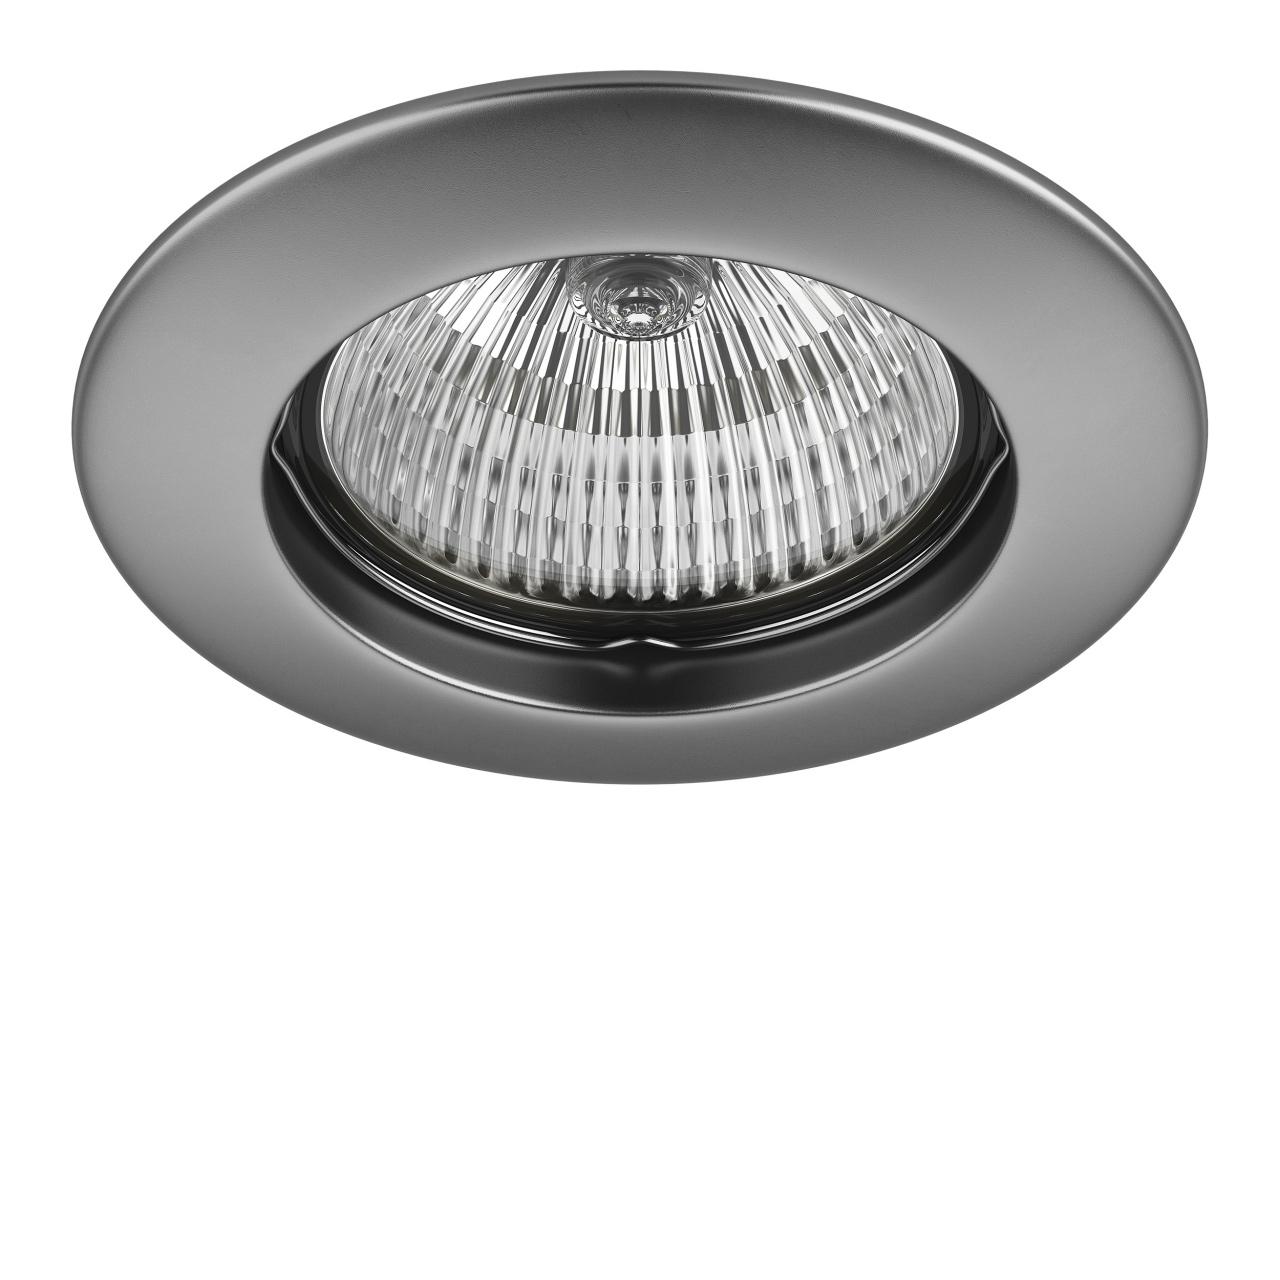 Светильник Teso FIX MR16 / HP16 хром / матовый Lightstar 011079